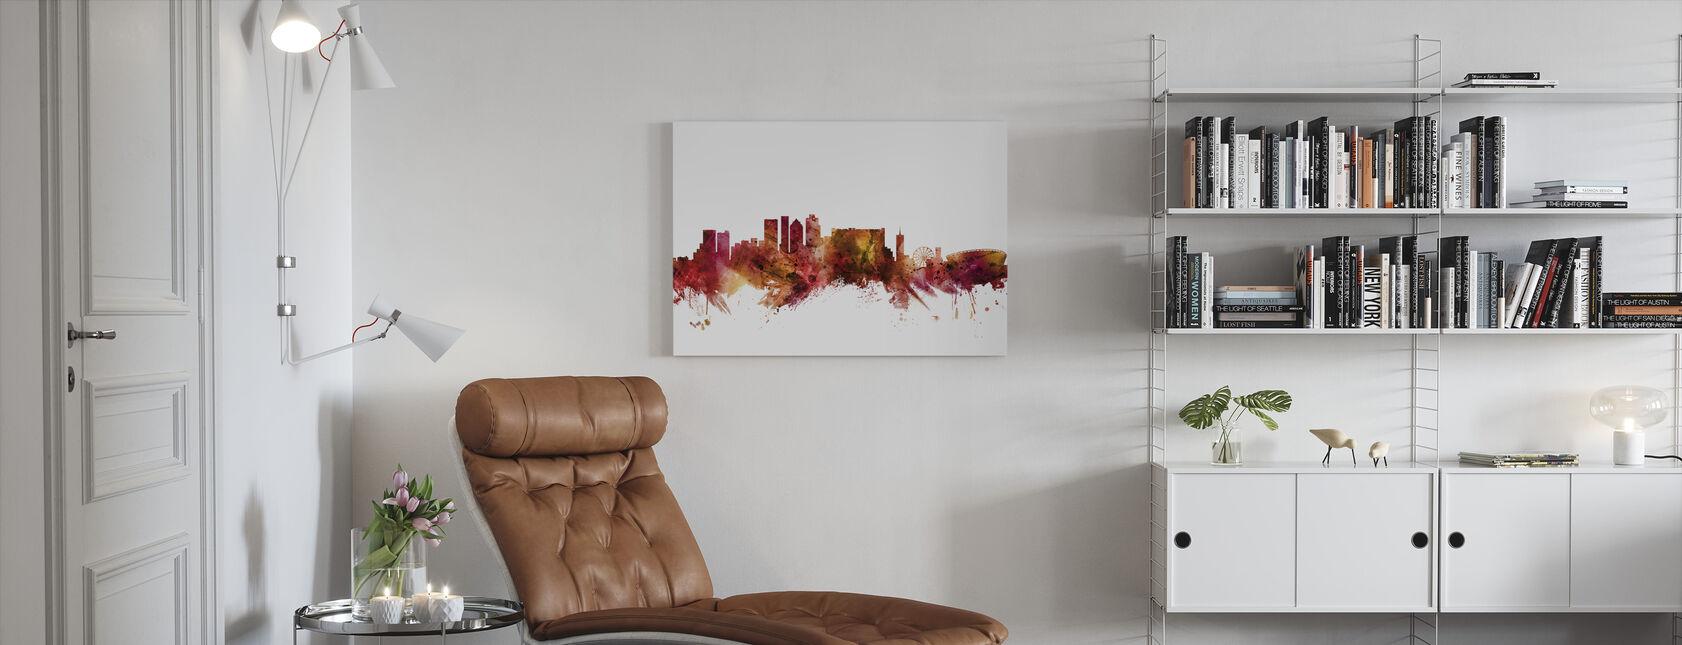 Kaapstad Zuid-Afrika Skyline - Canvas print - Woonkamer